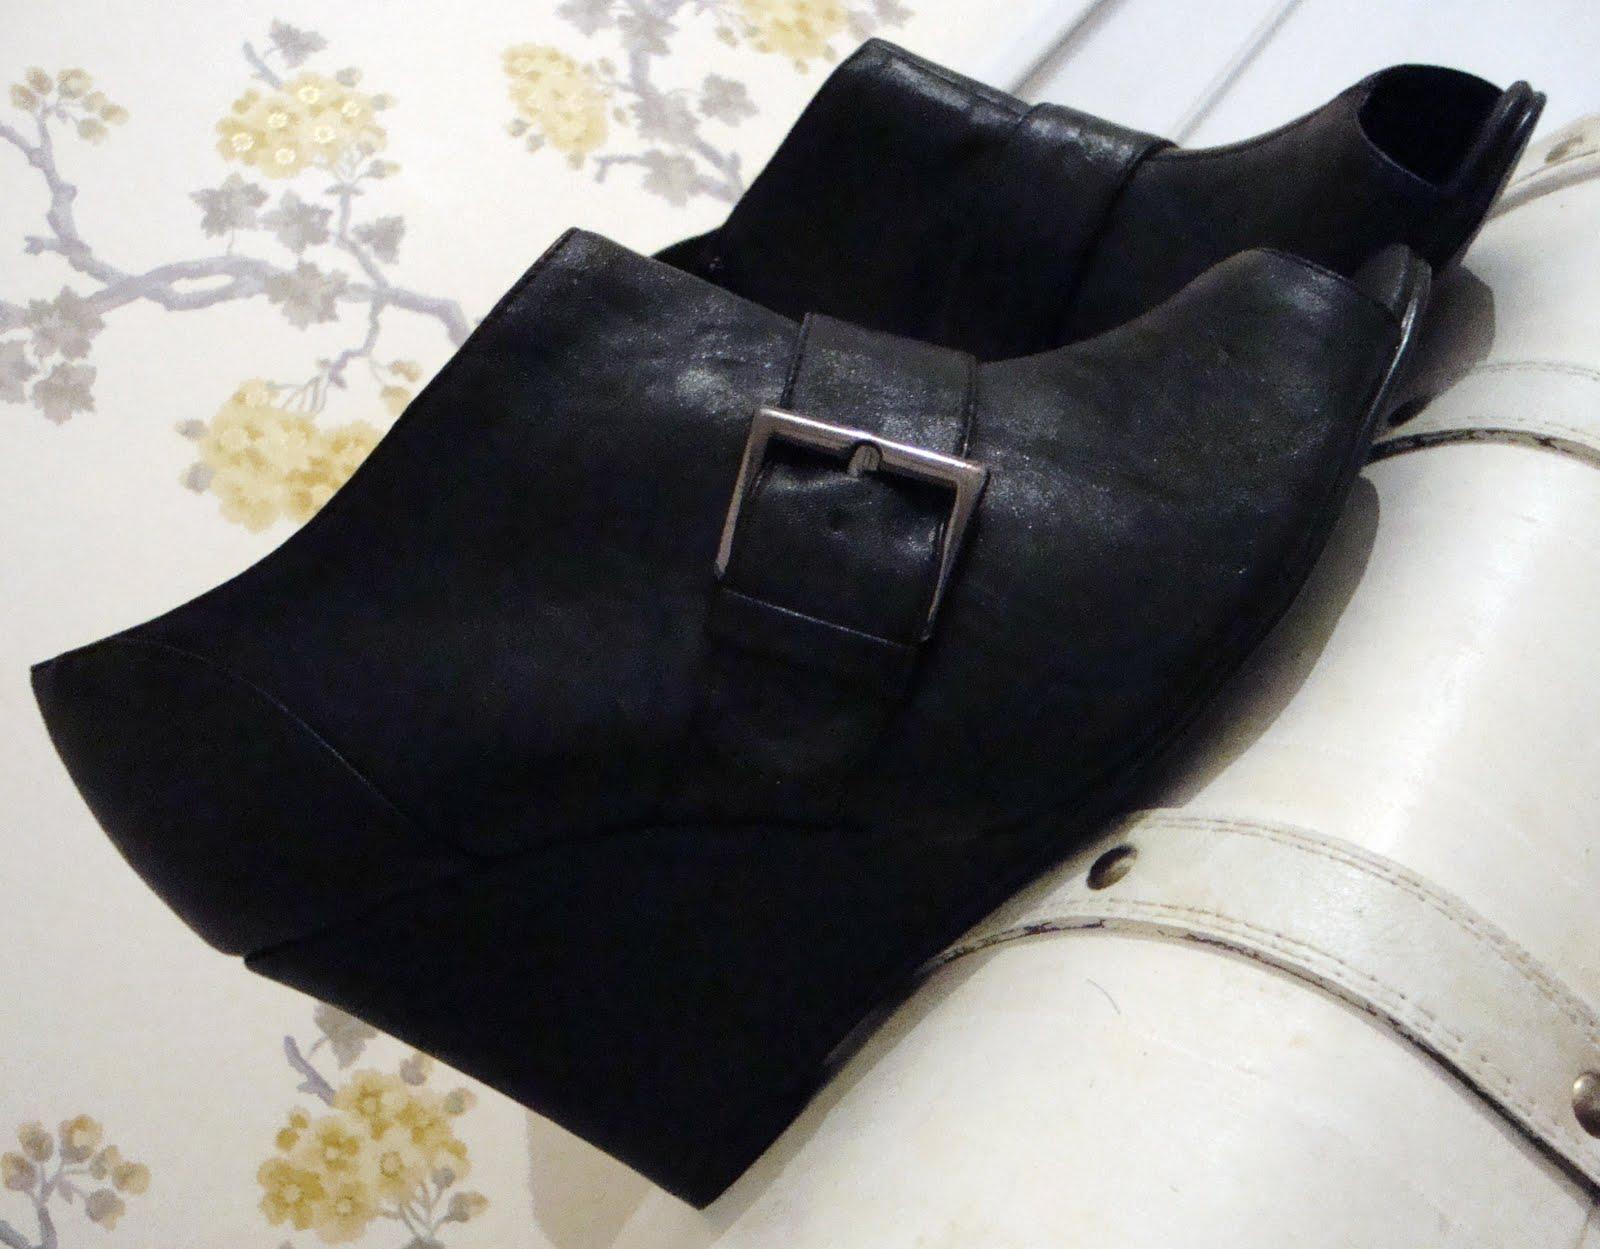 The 8 Primark Shoe That Looks Just Like Prada advise